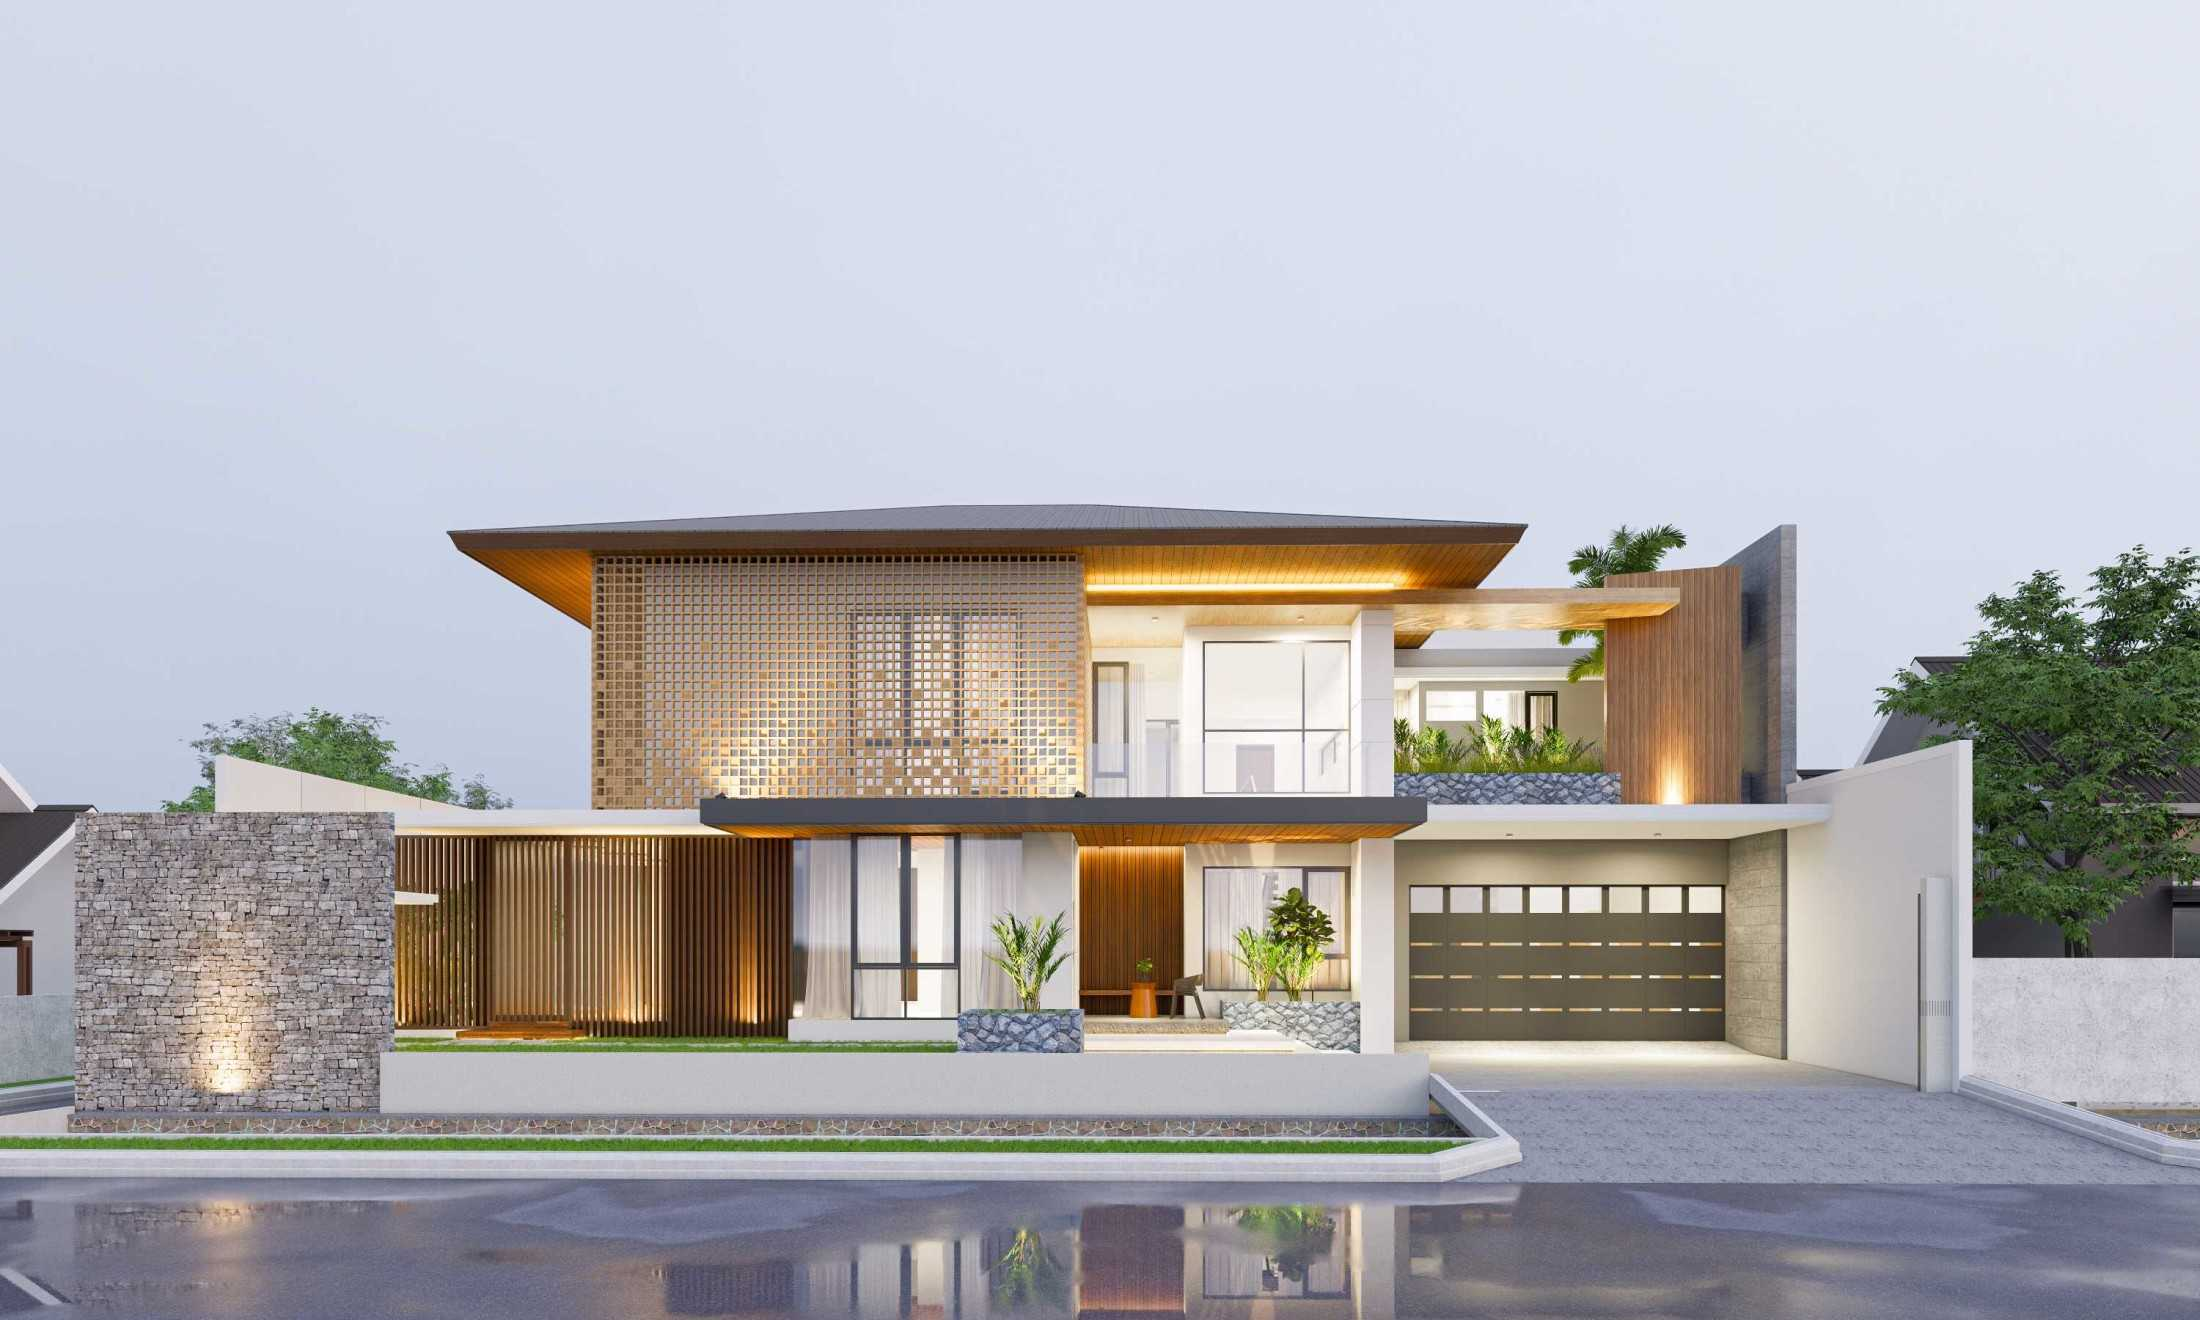 Conarch Studio Tropical Modern W House Surakarta, Kota Surakarta, Jawa Tengah, Indonesia Surakarta, Kota Surakarta, Jawa Tengah, Indonesia Facade  135164